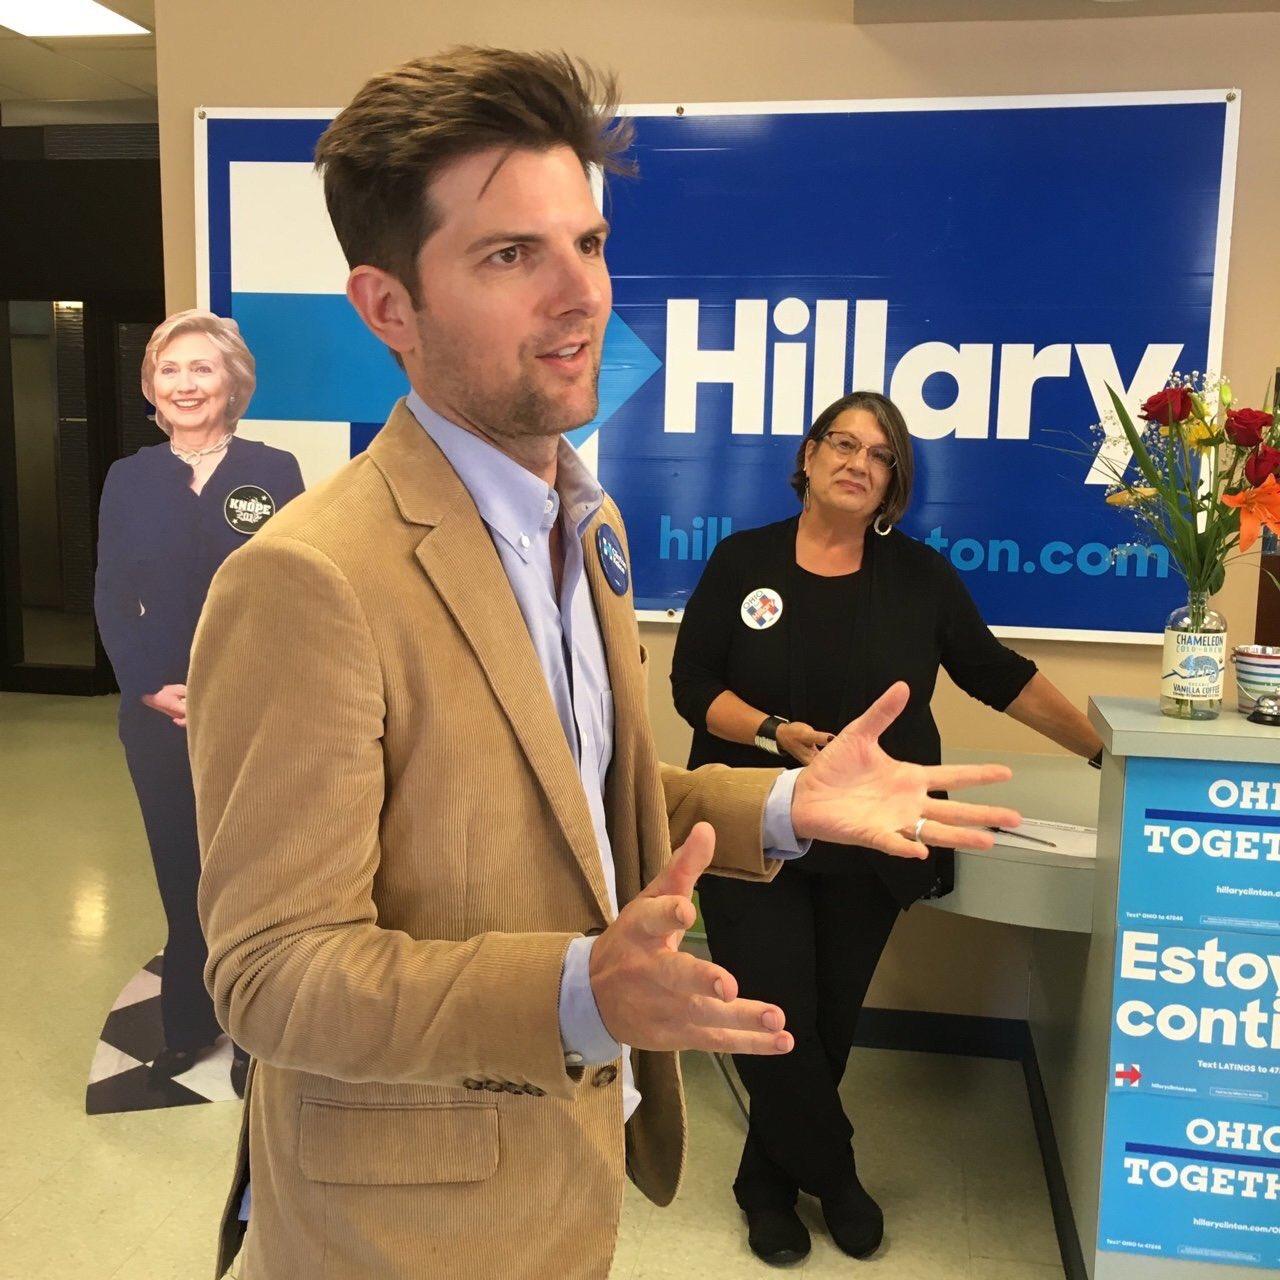 RT @zackbeauchamp: Bold move: Clinton…